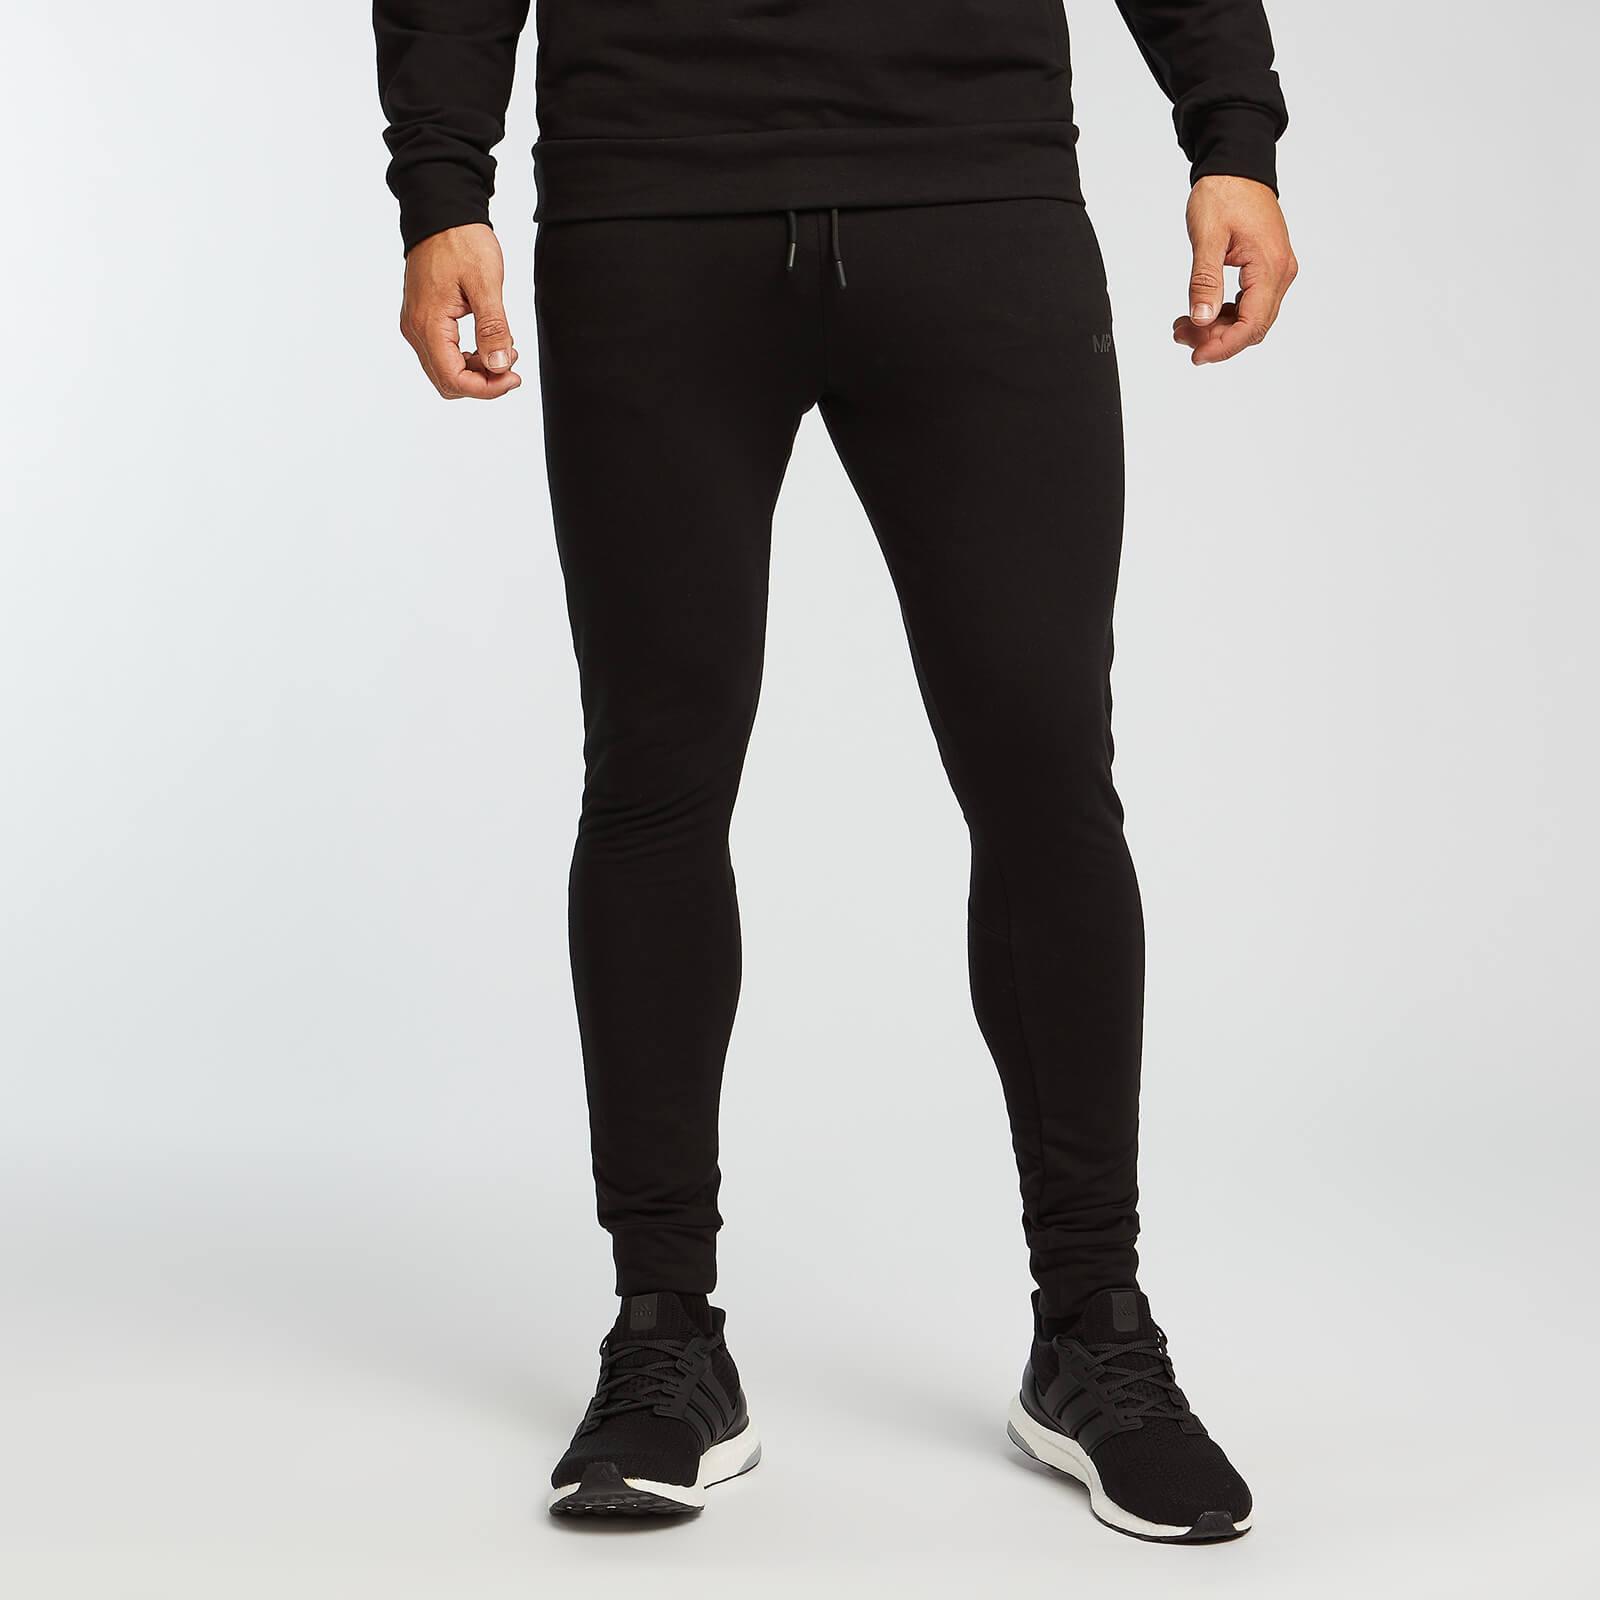 Myprotein Pantaloni da jogging slim fit MP Form da uomo - Neri - XS